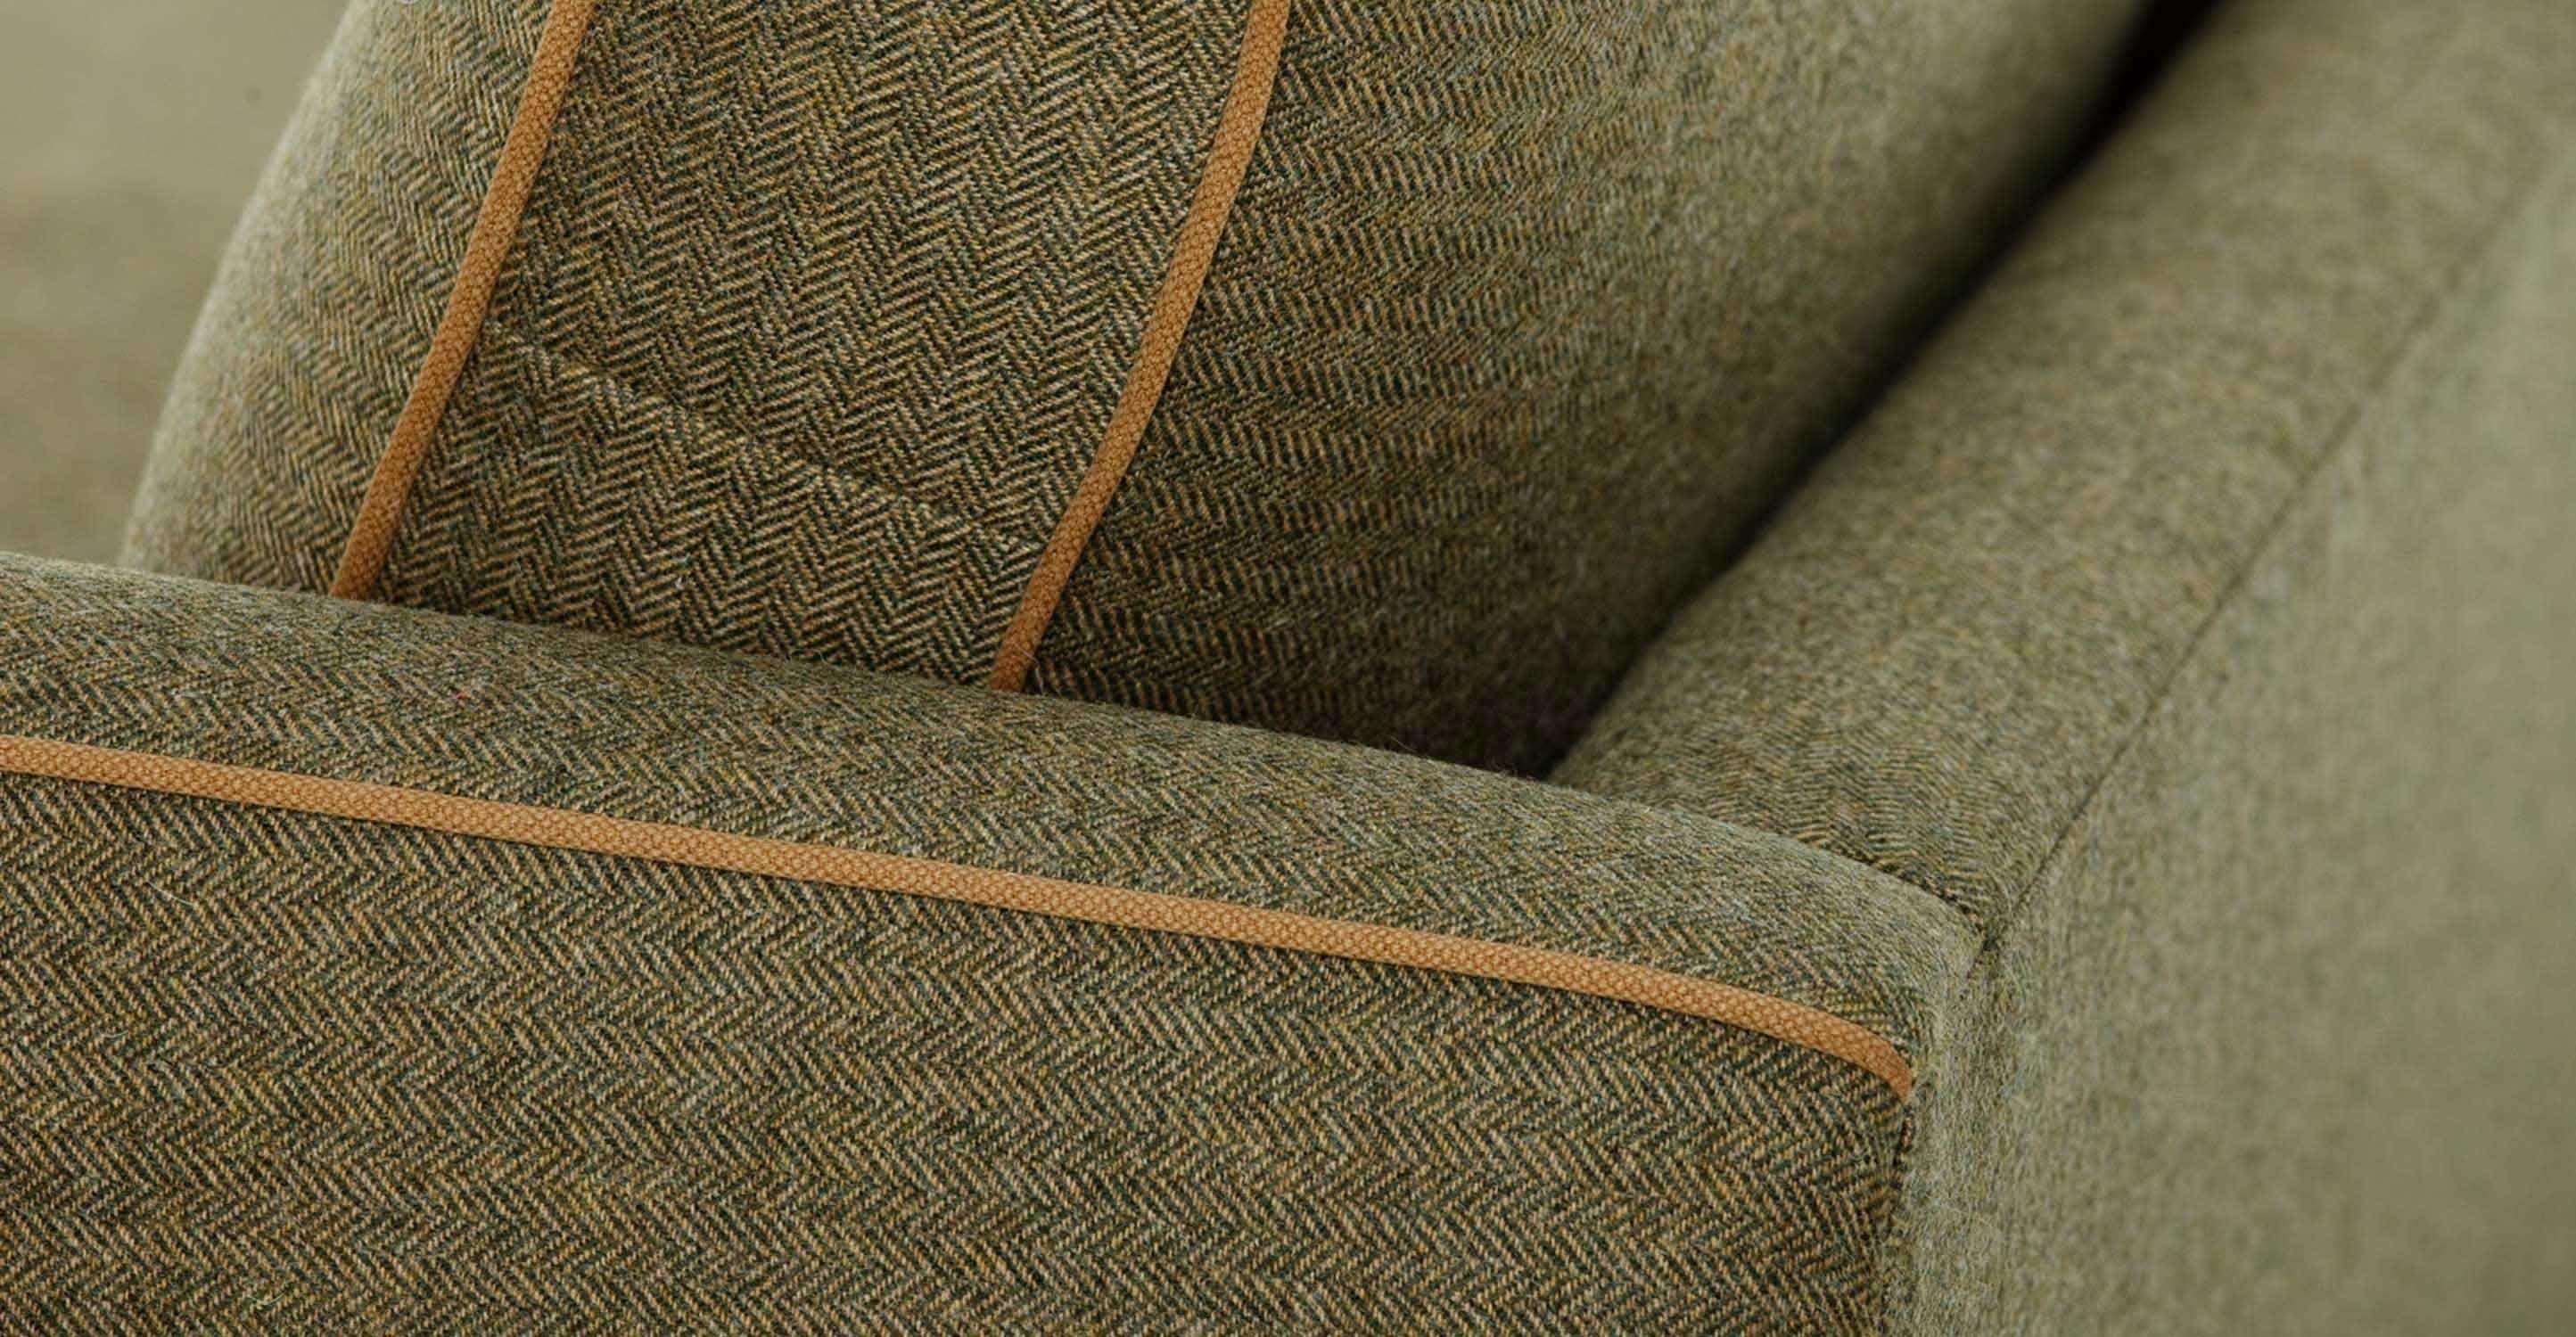 Wolseley 3 Seater Sofa In Wool Tweed | Made Throughout Tweed Fabric Sofas (Image 19 of 20)